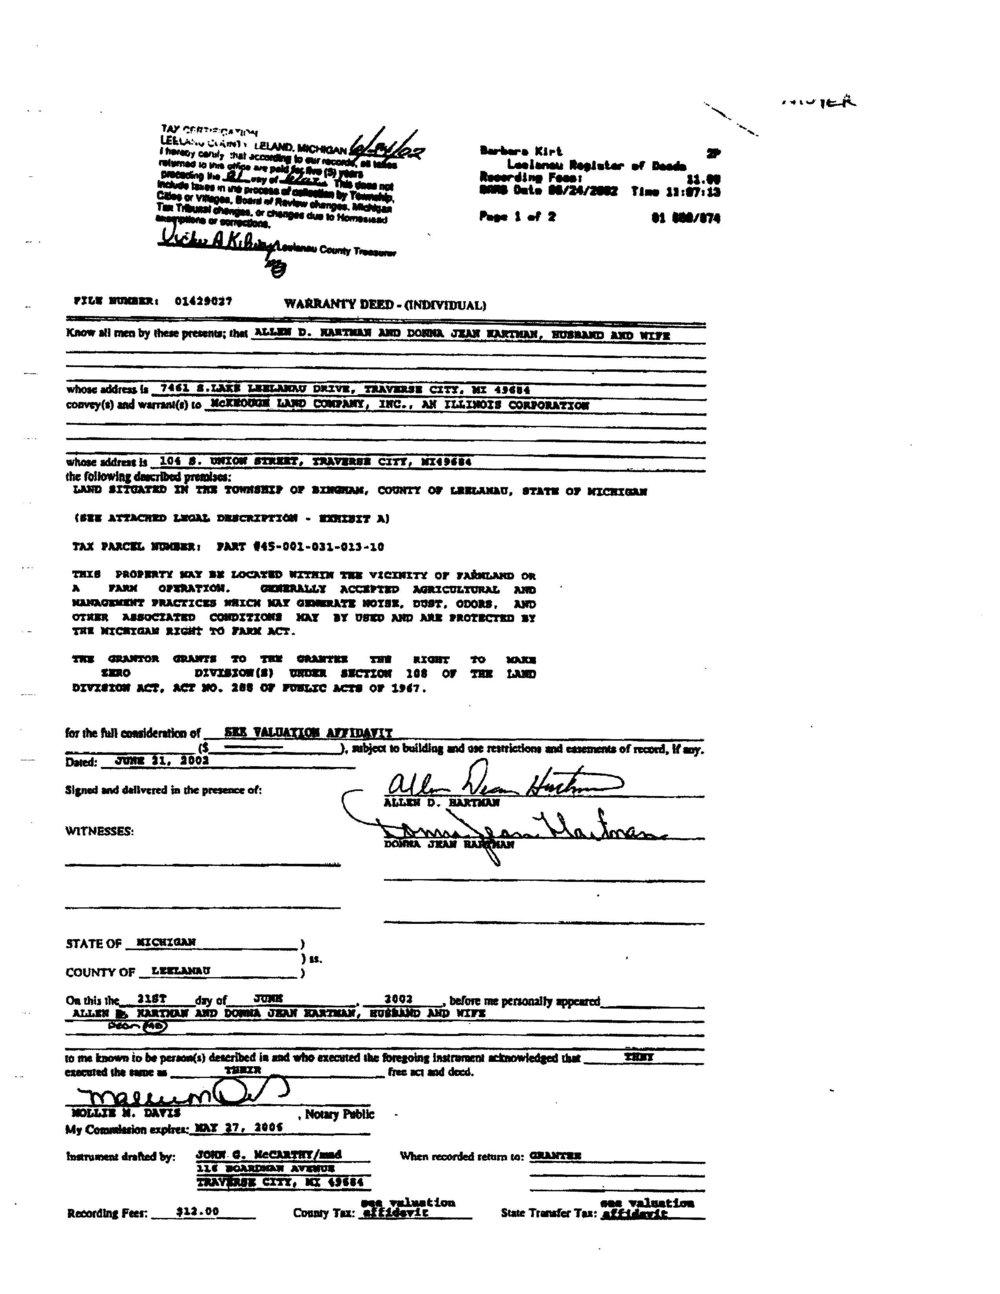 7311 S Lake Leelanau Drive, Traverse City Acreage for sale in Leelanau County by Oltersdorf Realty LLC (16).jpg